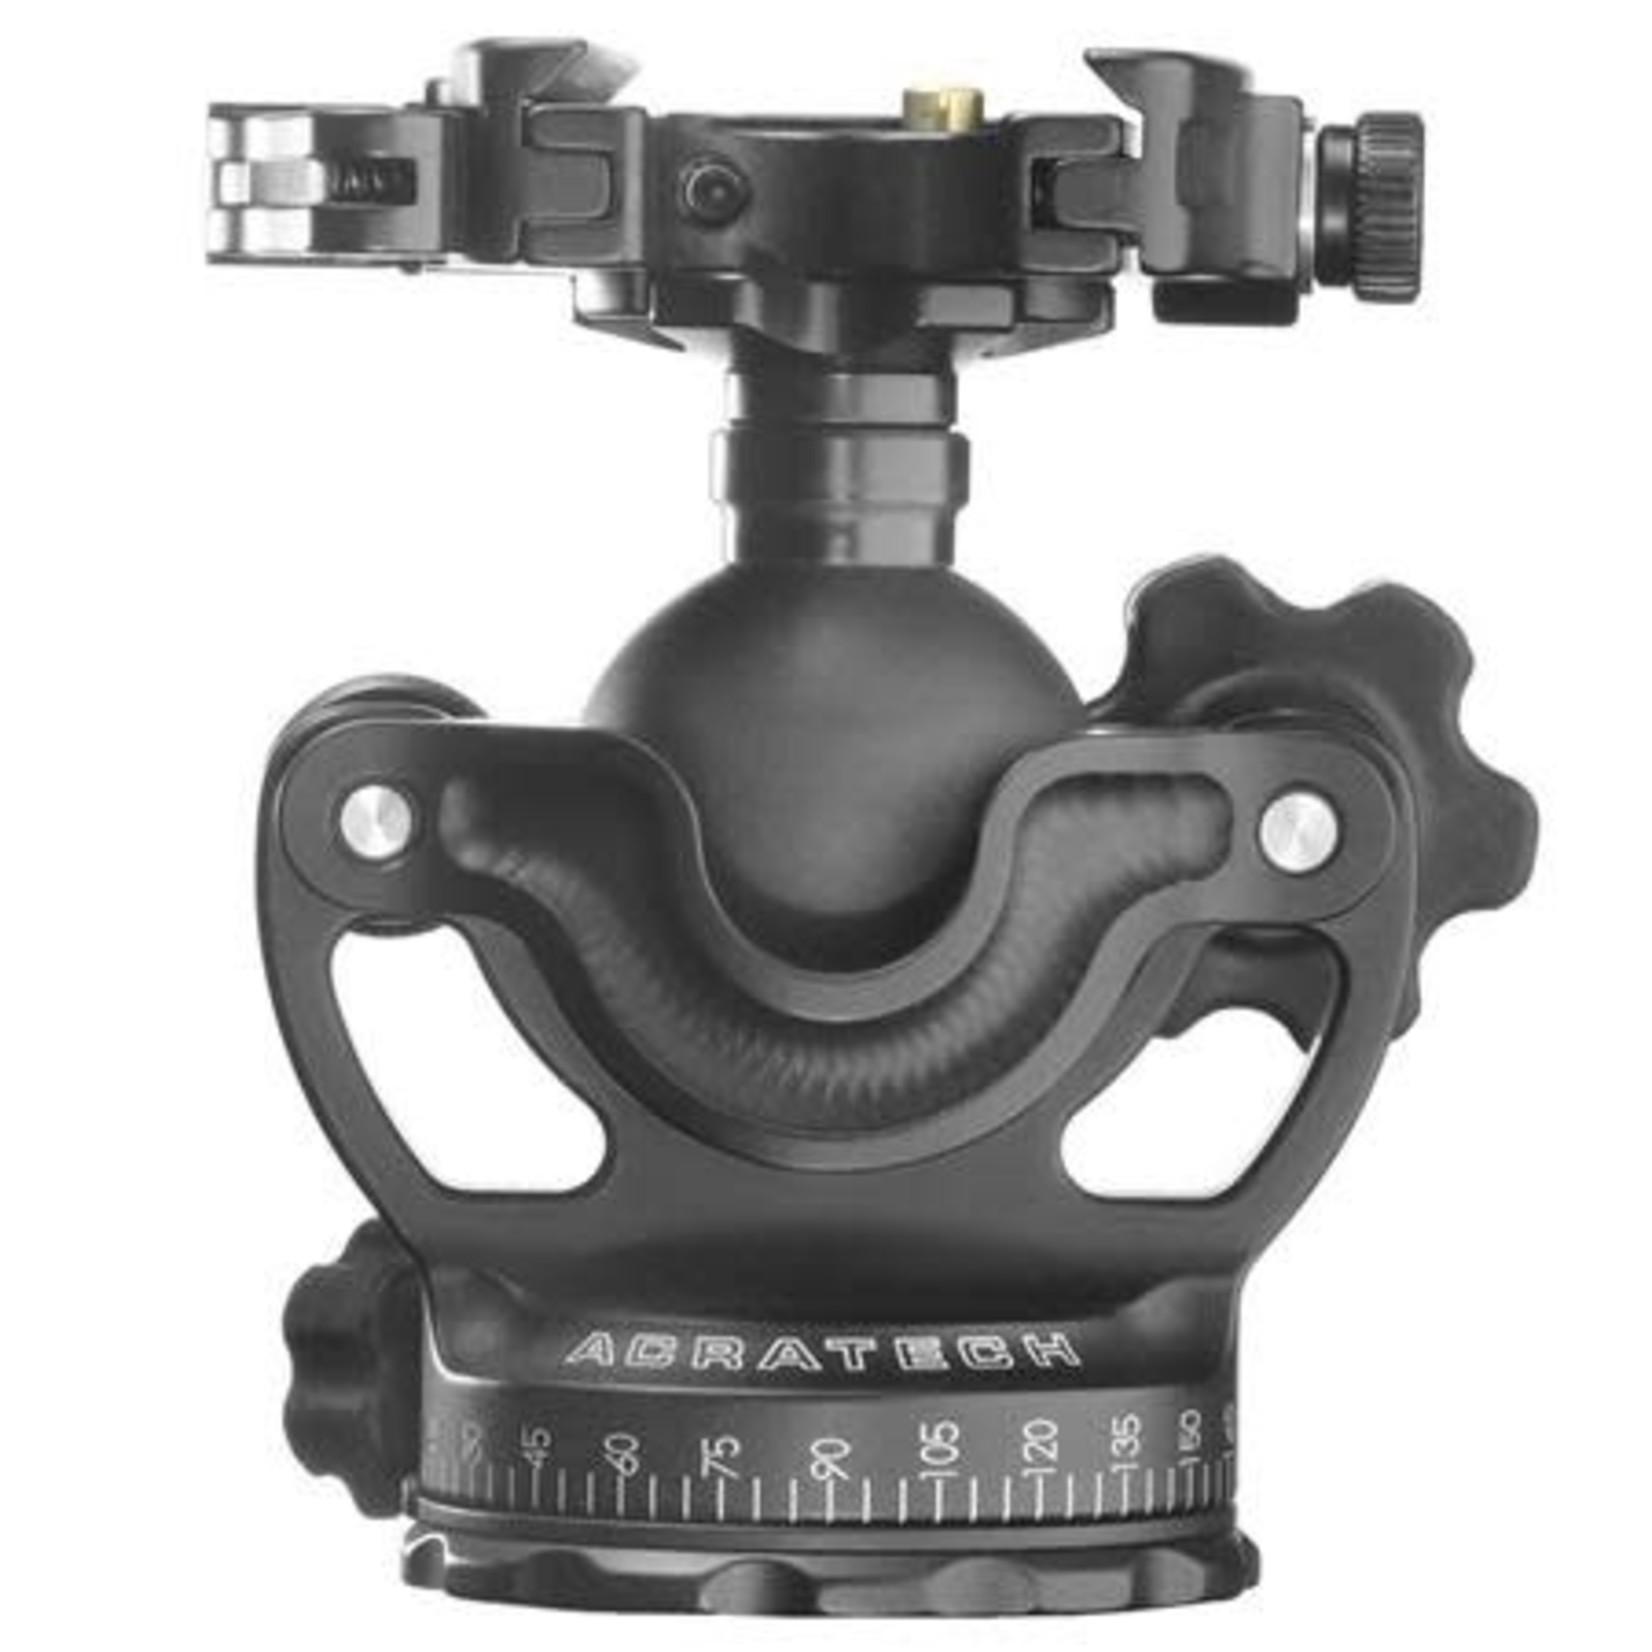 AcraTech AcraTech GXP Ballhead with lever clamp